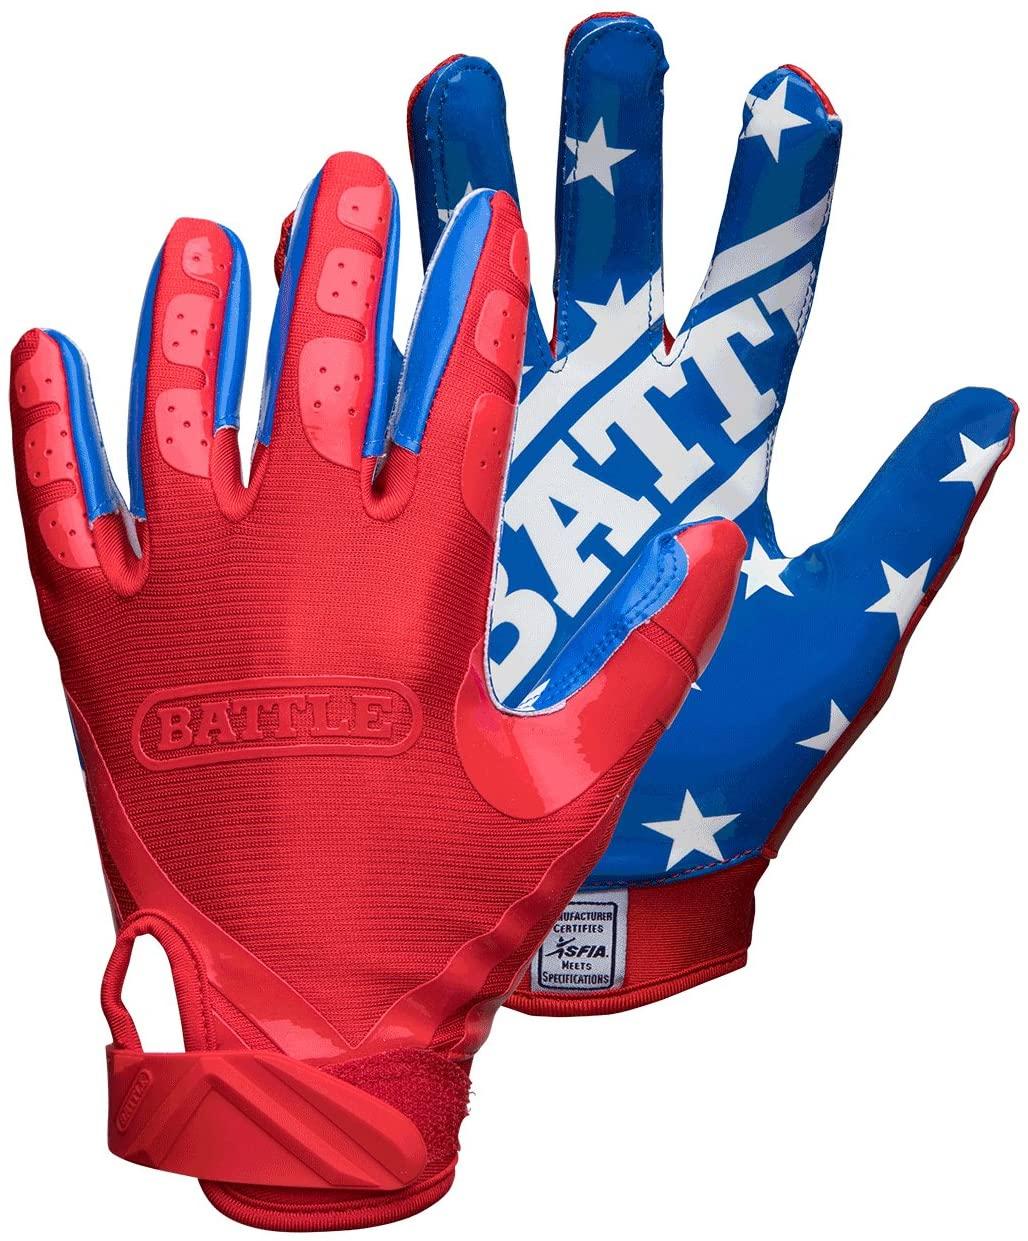 Battle All American Adult Football Gloves, Medium